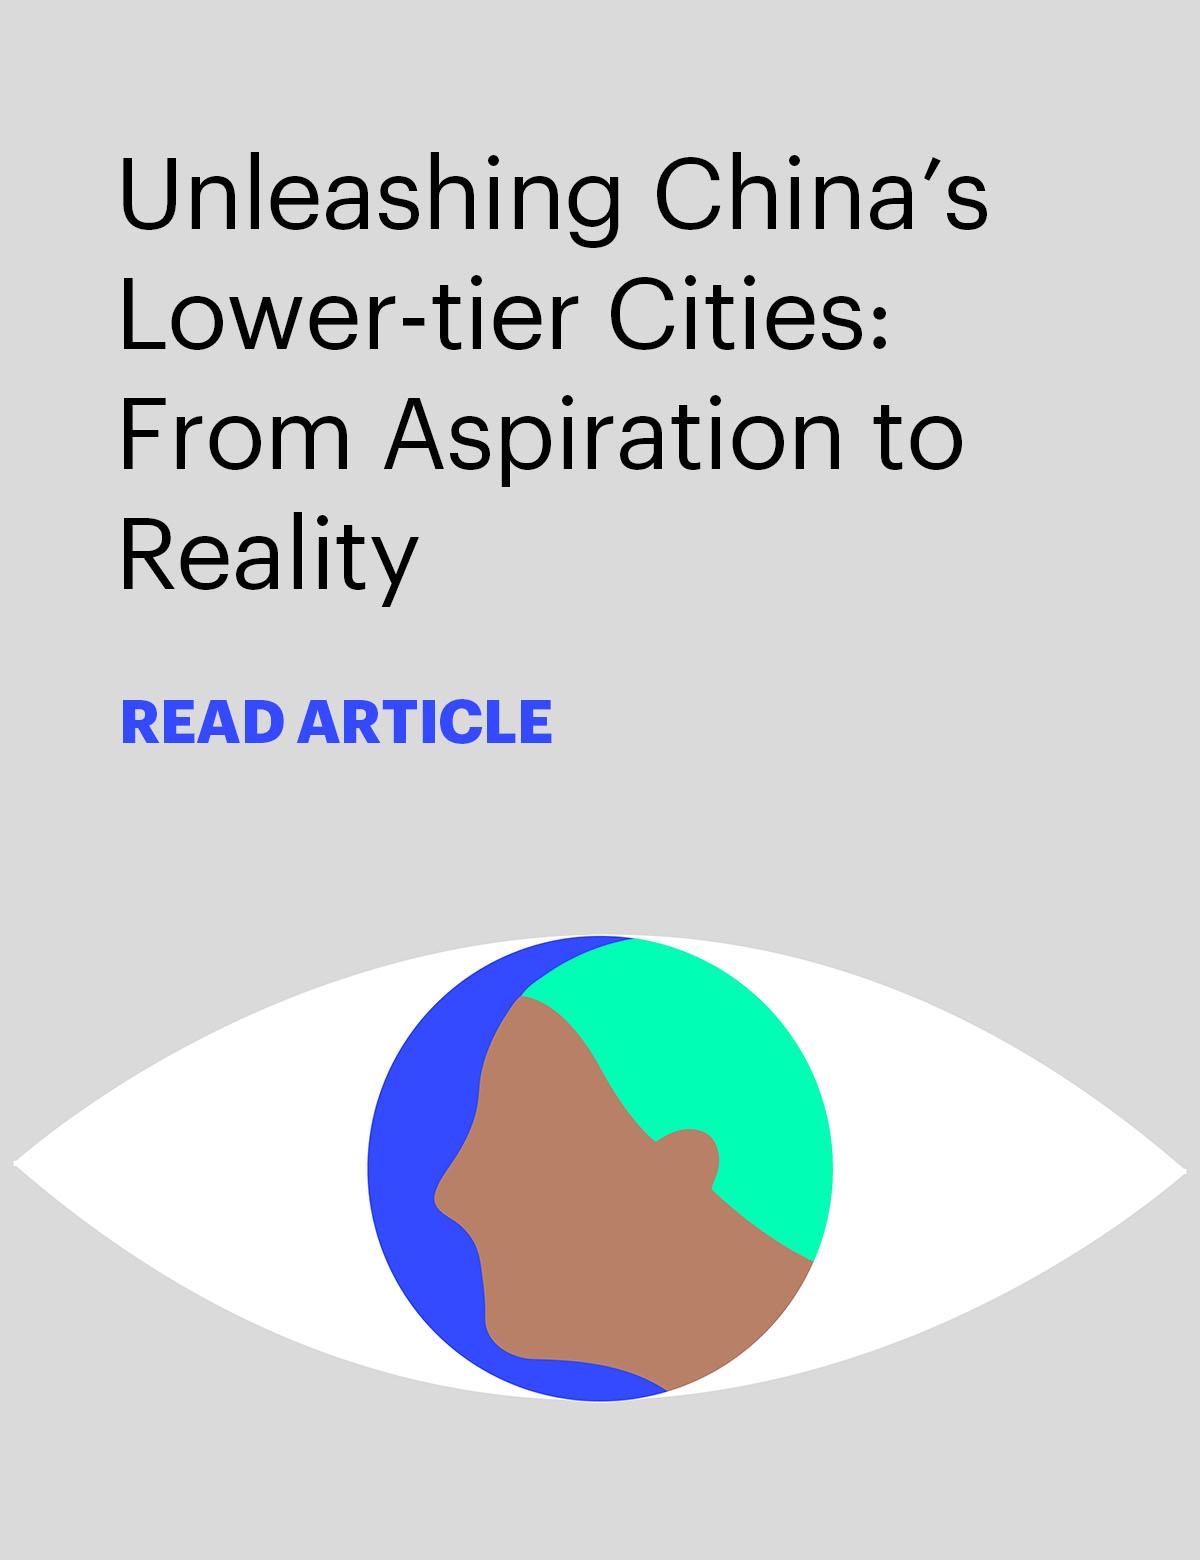 Unleashing China's lower-tier cities